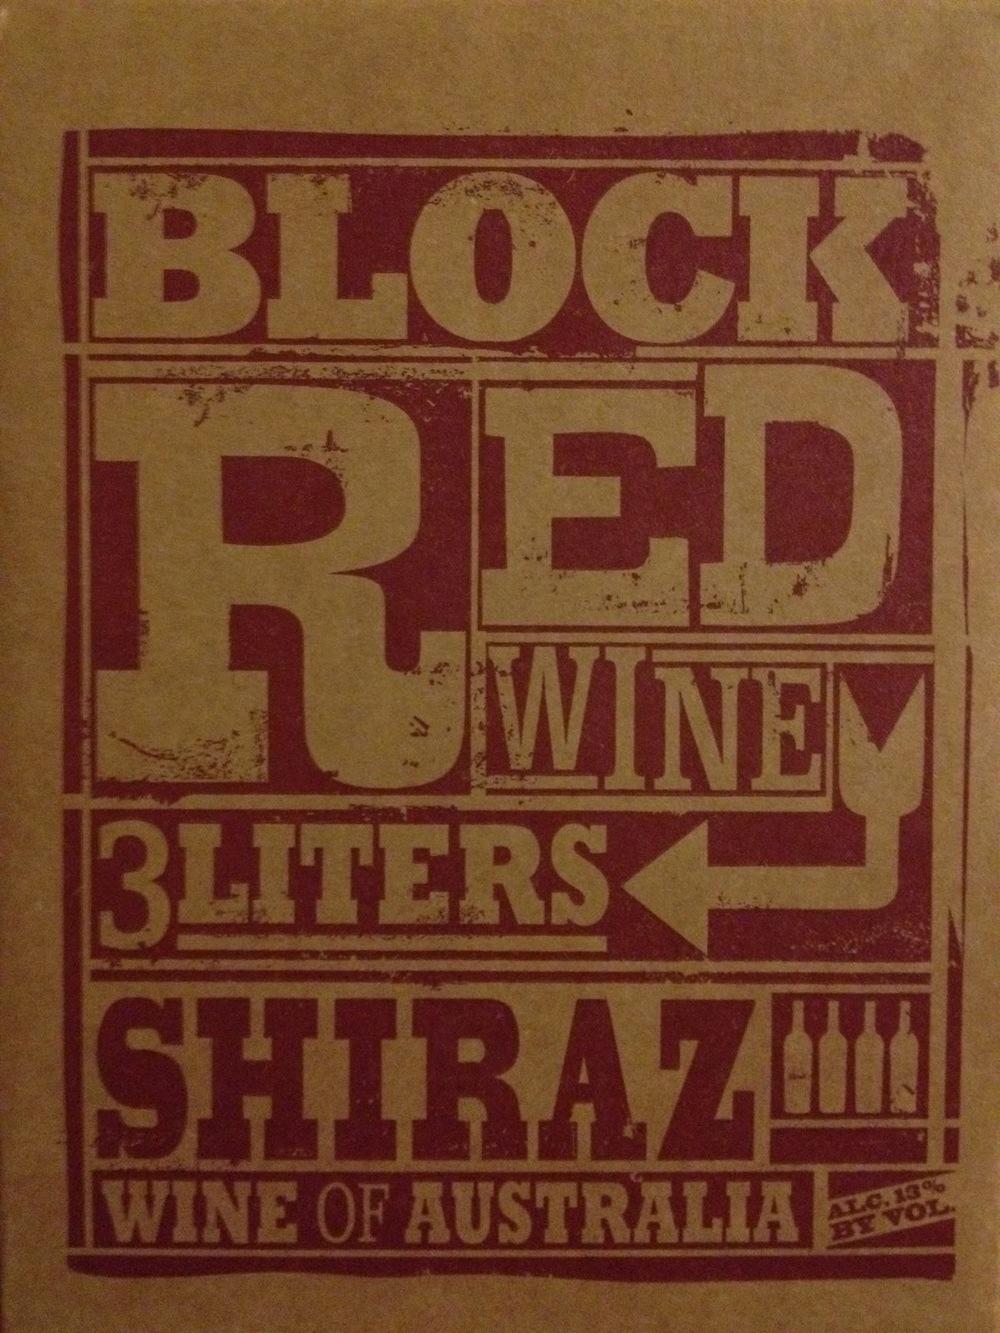 Trader Joes Block Red Shiraz photo.JPG